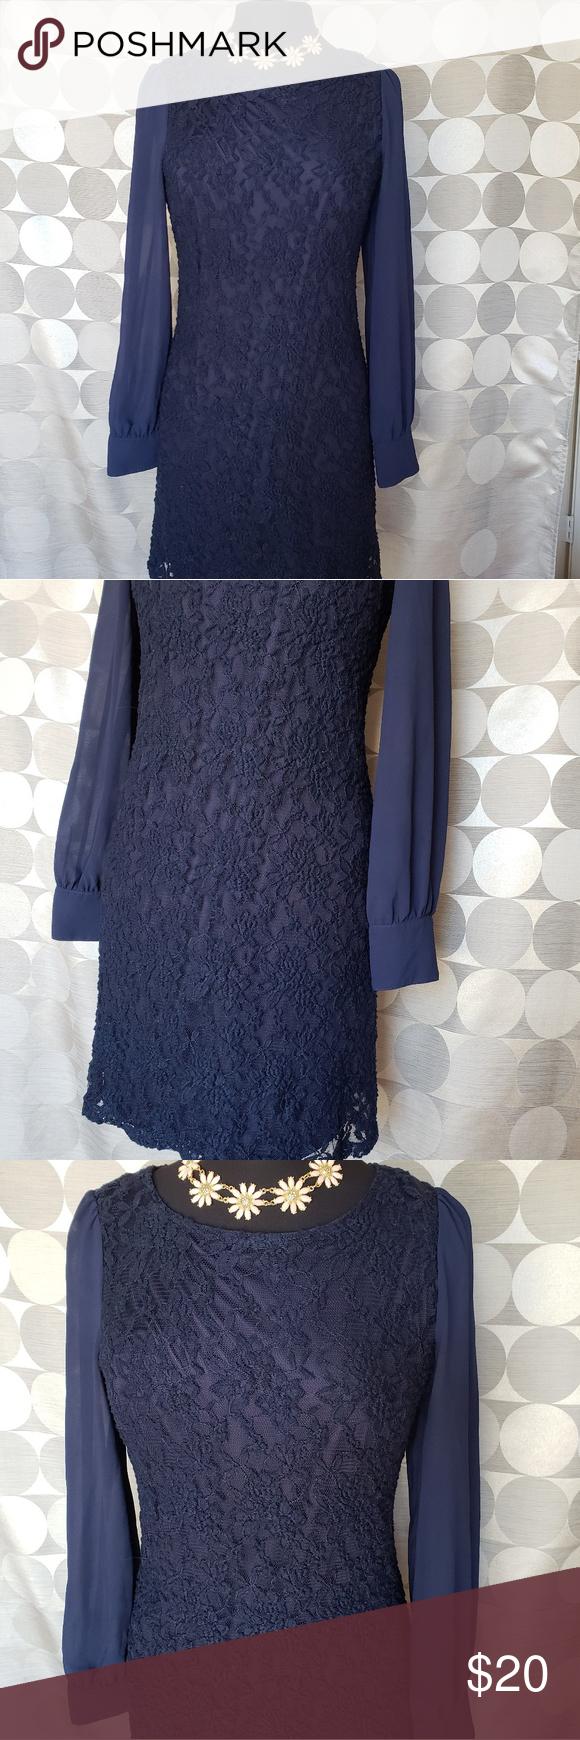 H&m blue lace dress  HuM u navy blue lace dress  My Posh Picks  Pinterest